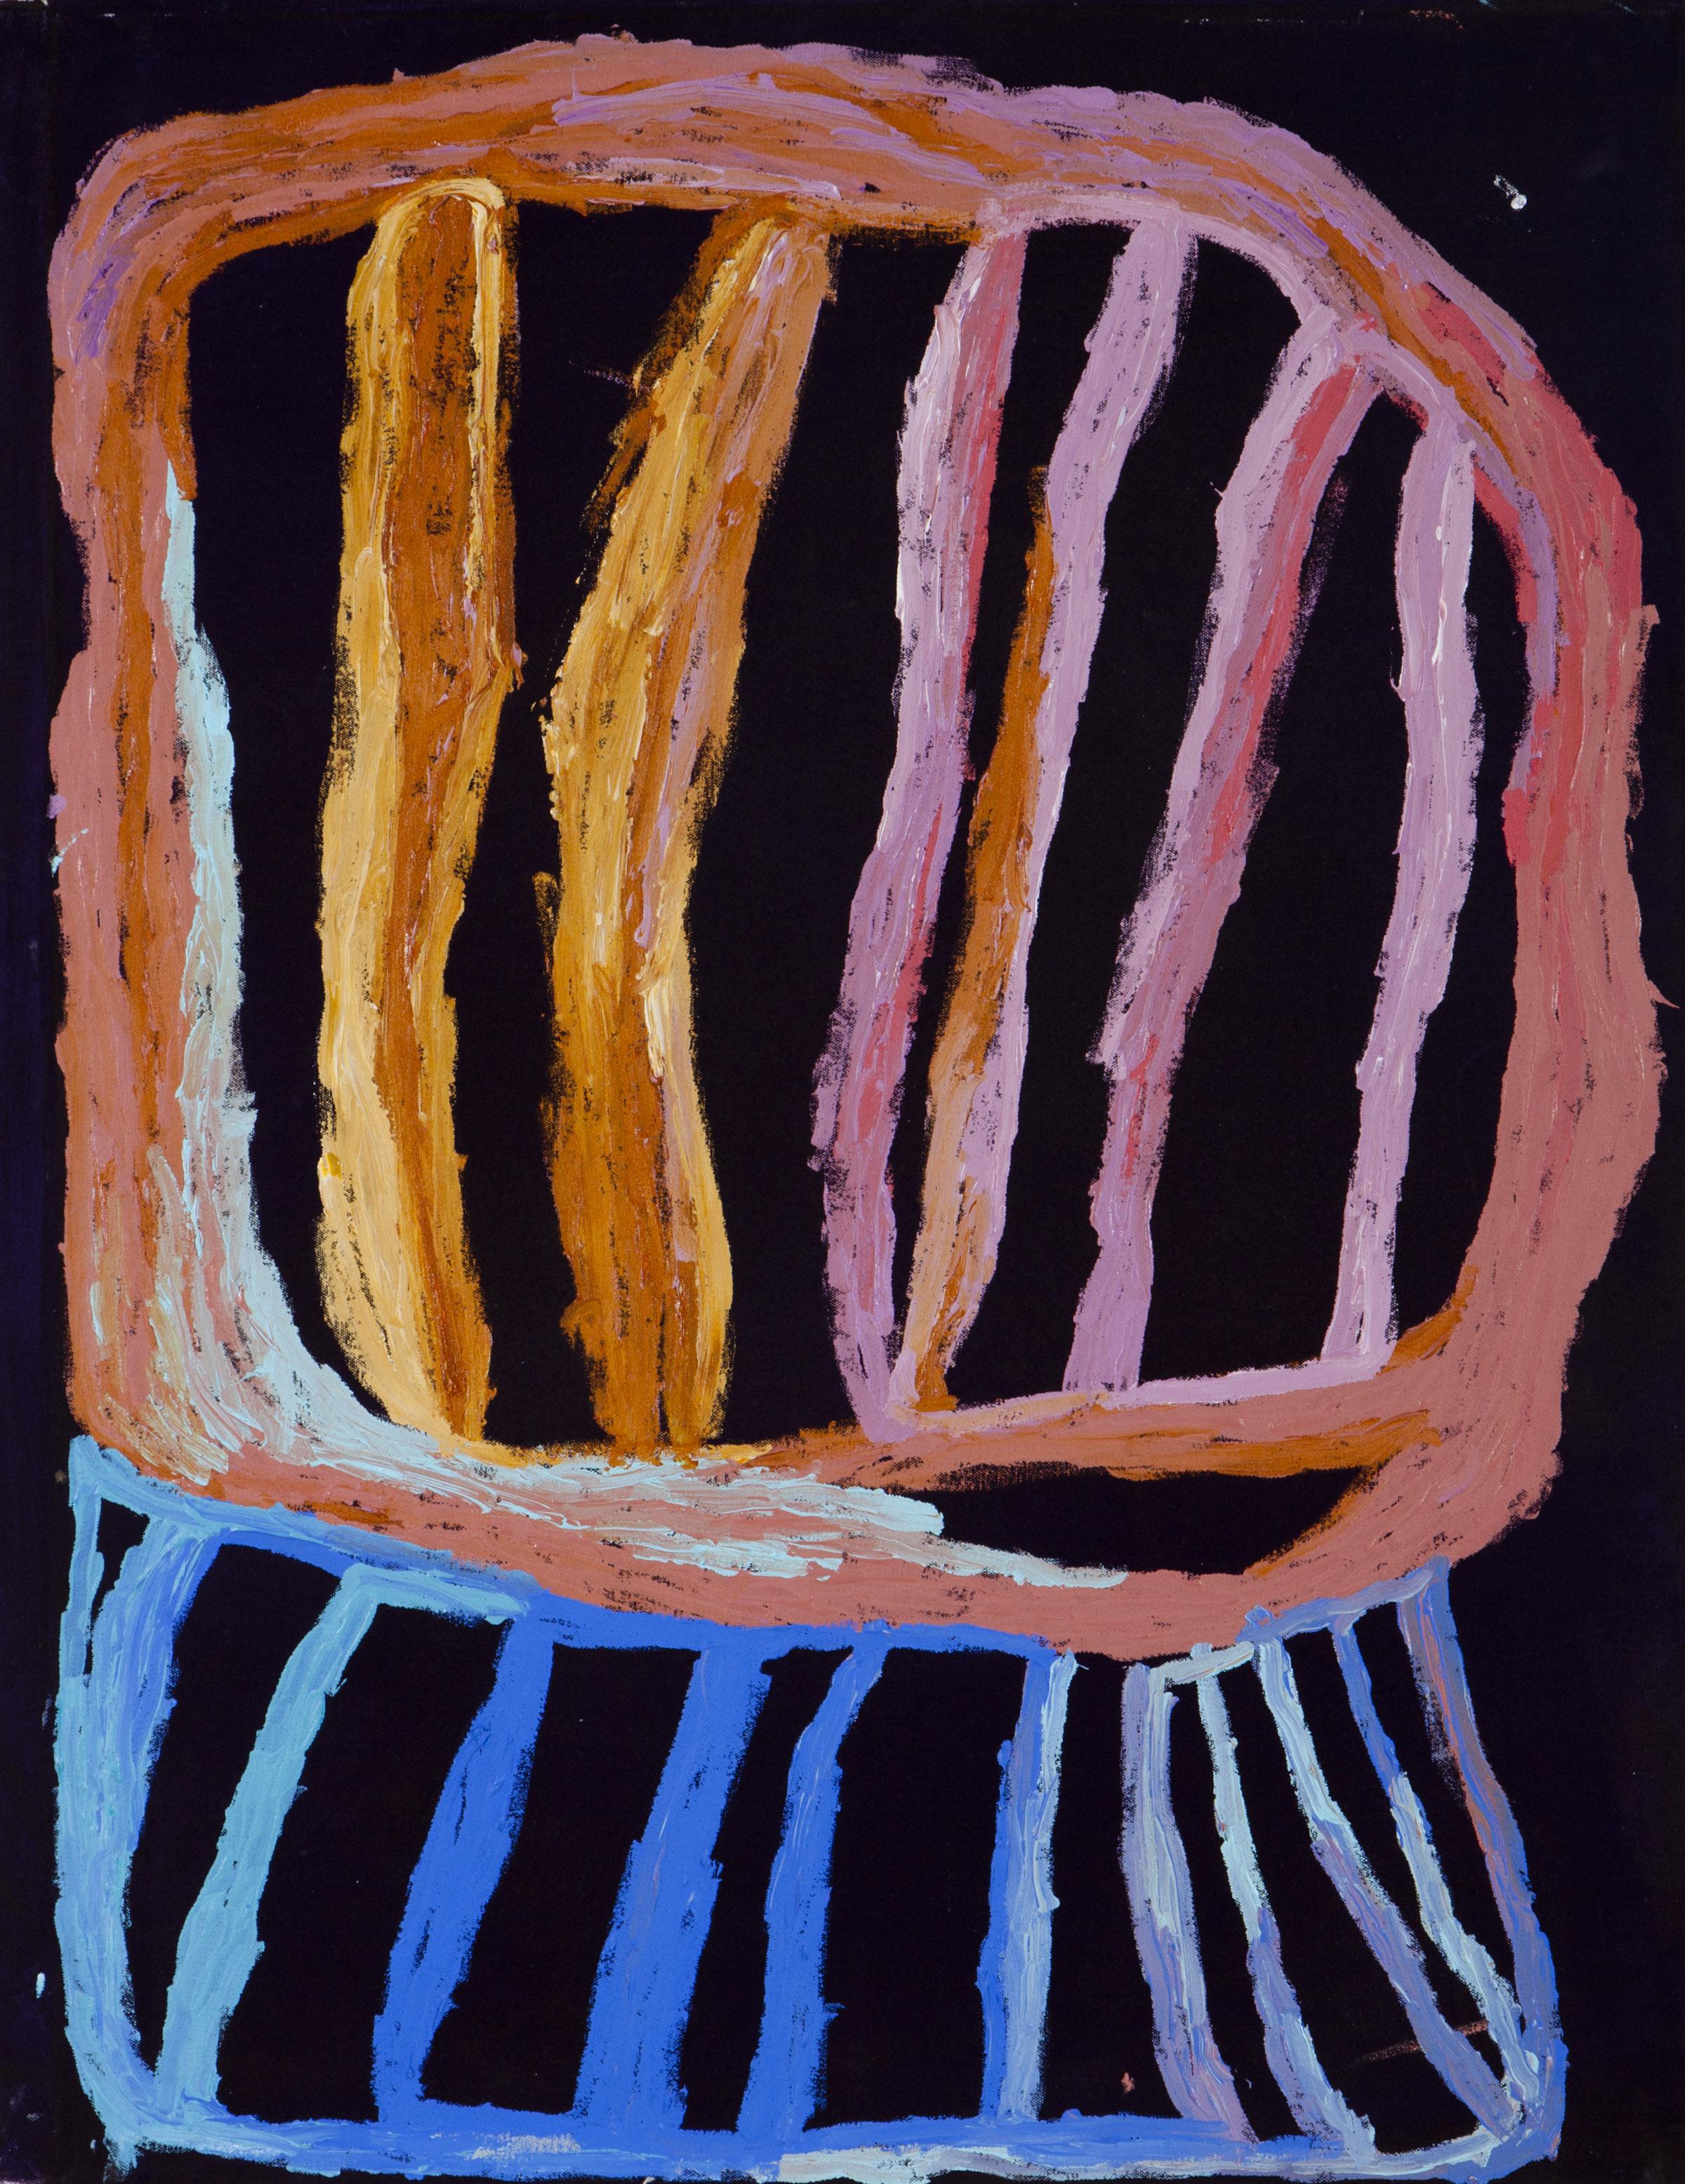 Nyarapayi Giles  Warmurrungu, 2012  40 x 32 inches (101.5 x 76 cm) Acrylic on Belgian linen Tjarlirli Artists Catalog #12-237   EMAIL INQUIRY